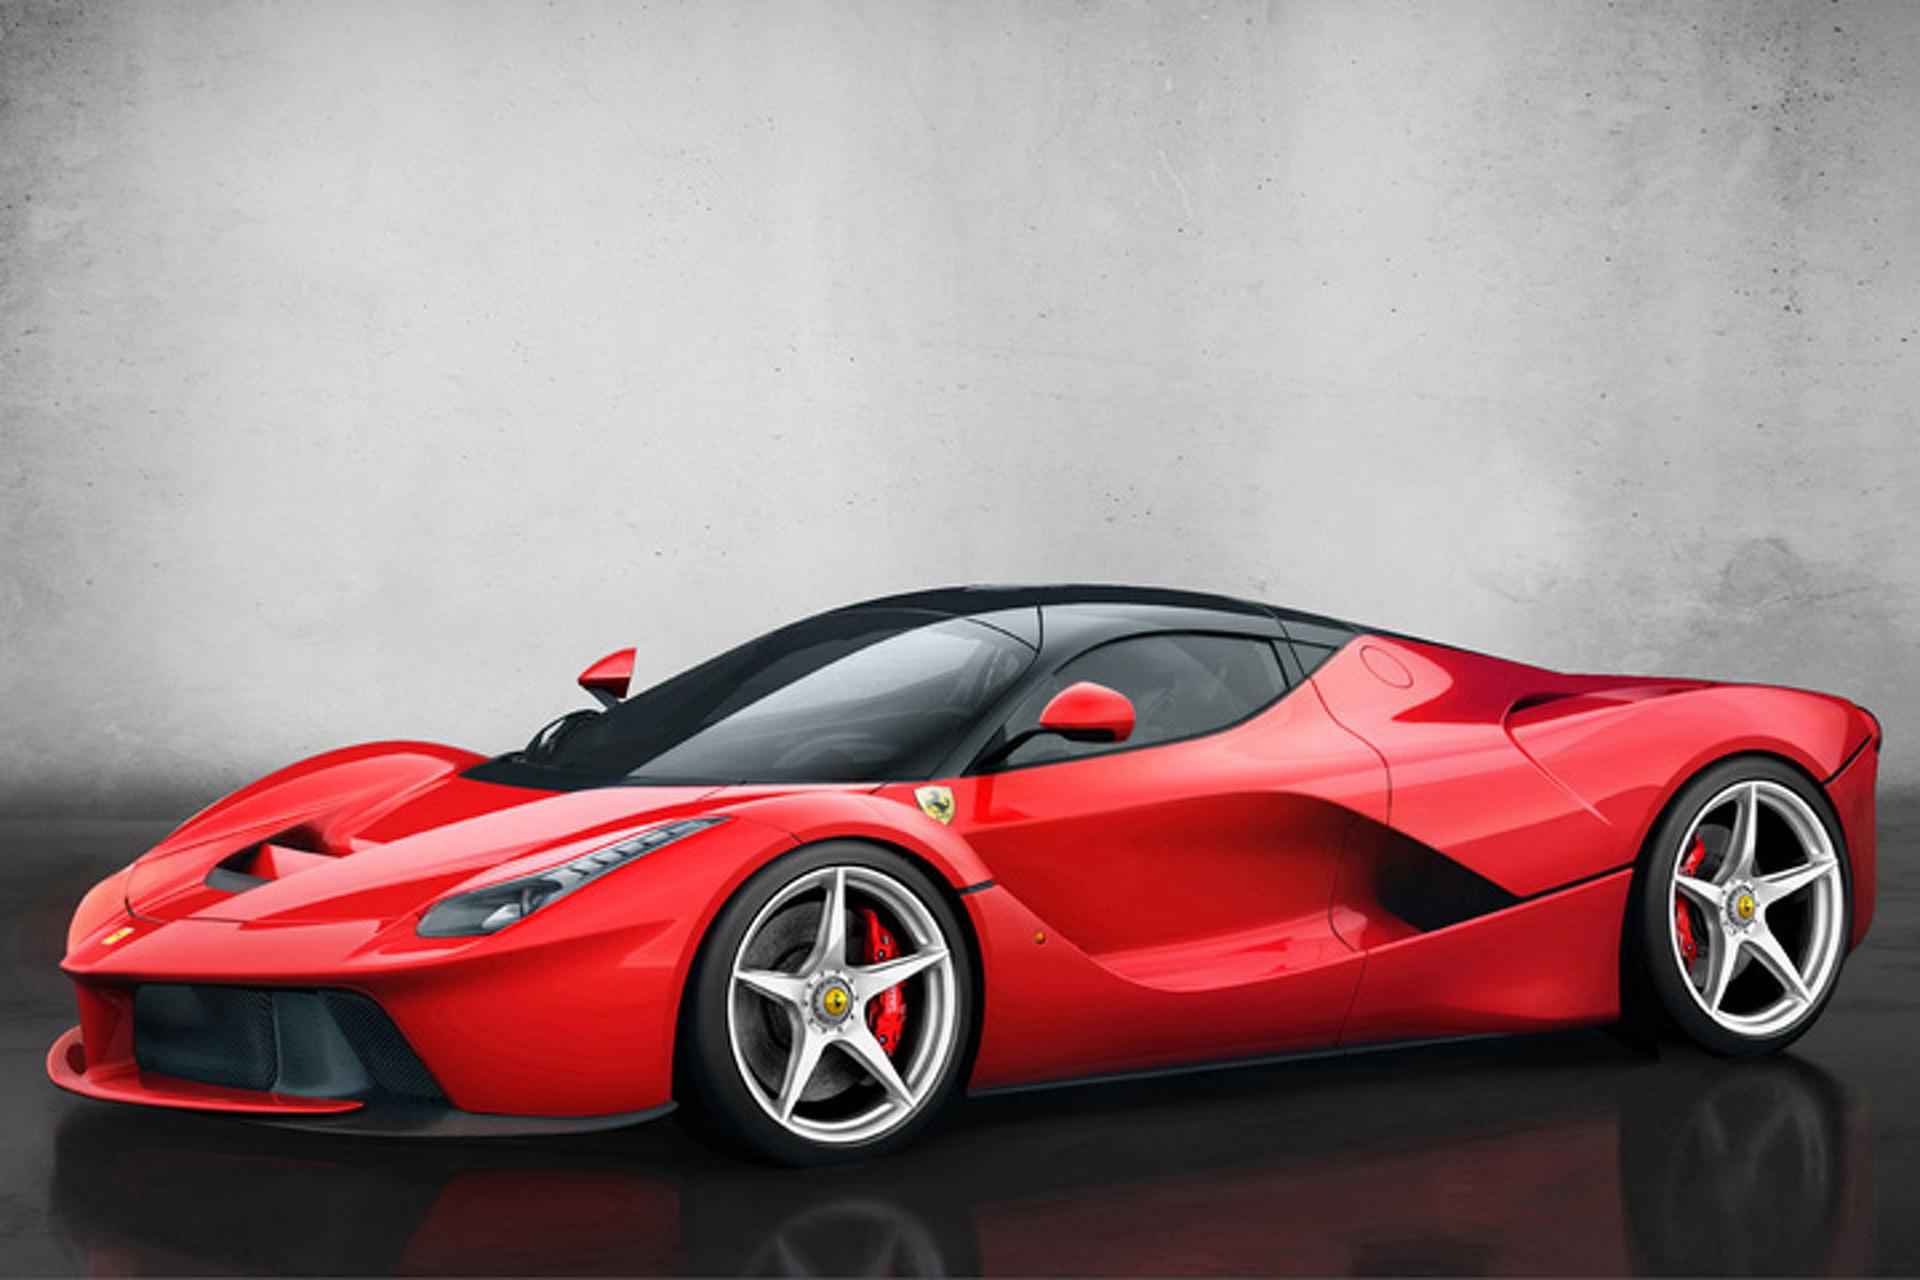 Beautiful Greatest Cars Images - Classic Cars Ideas - boiq.info